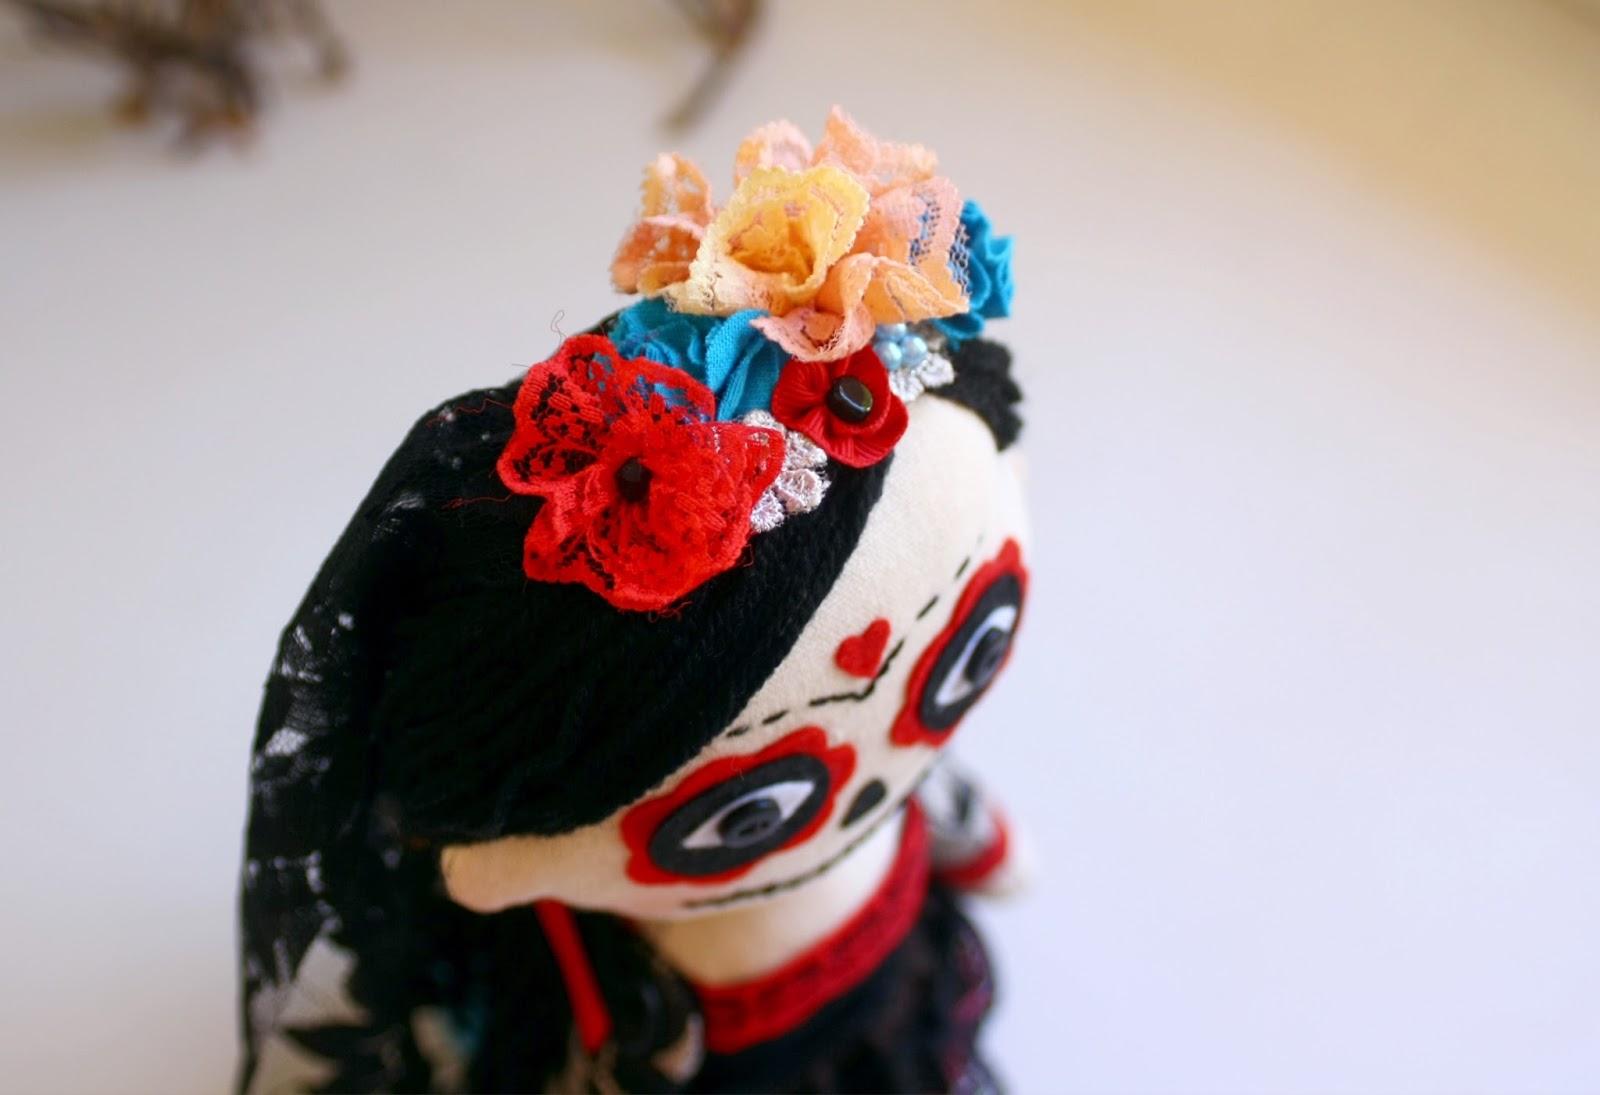 Corona de flores de la muñeca La Catrina mexicana.